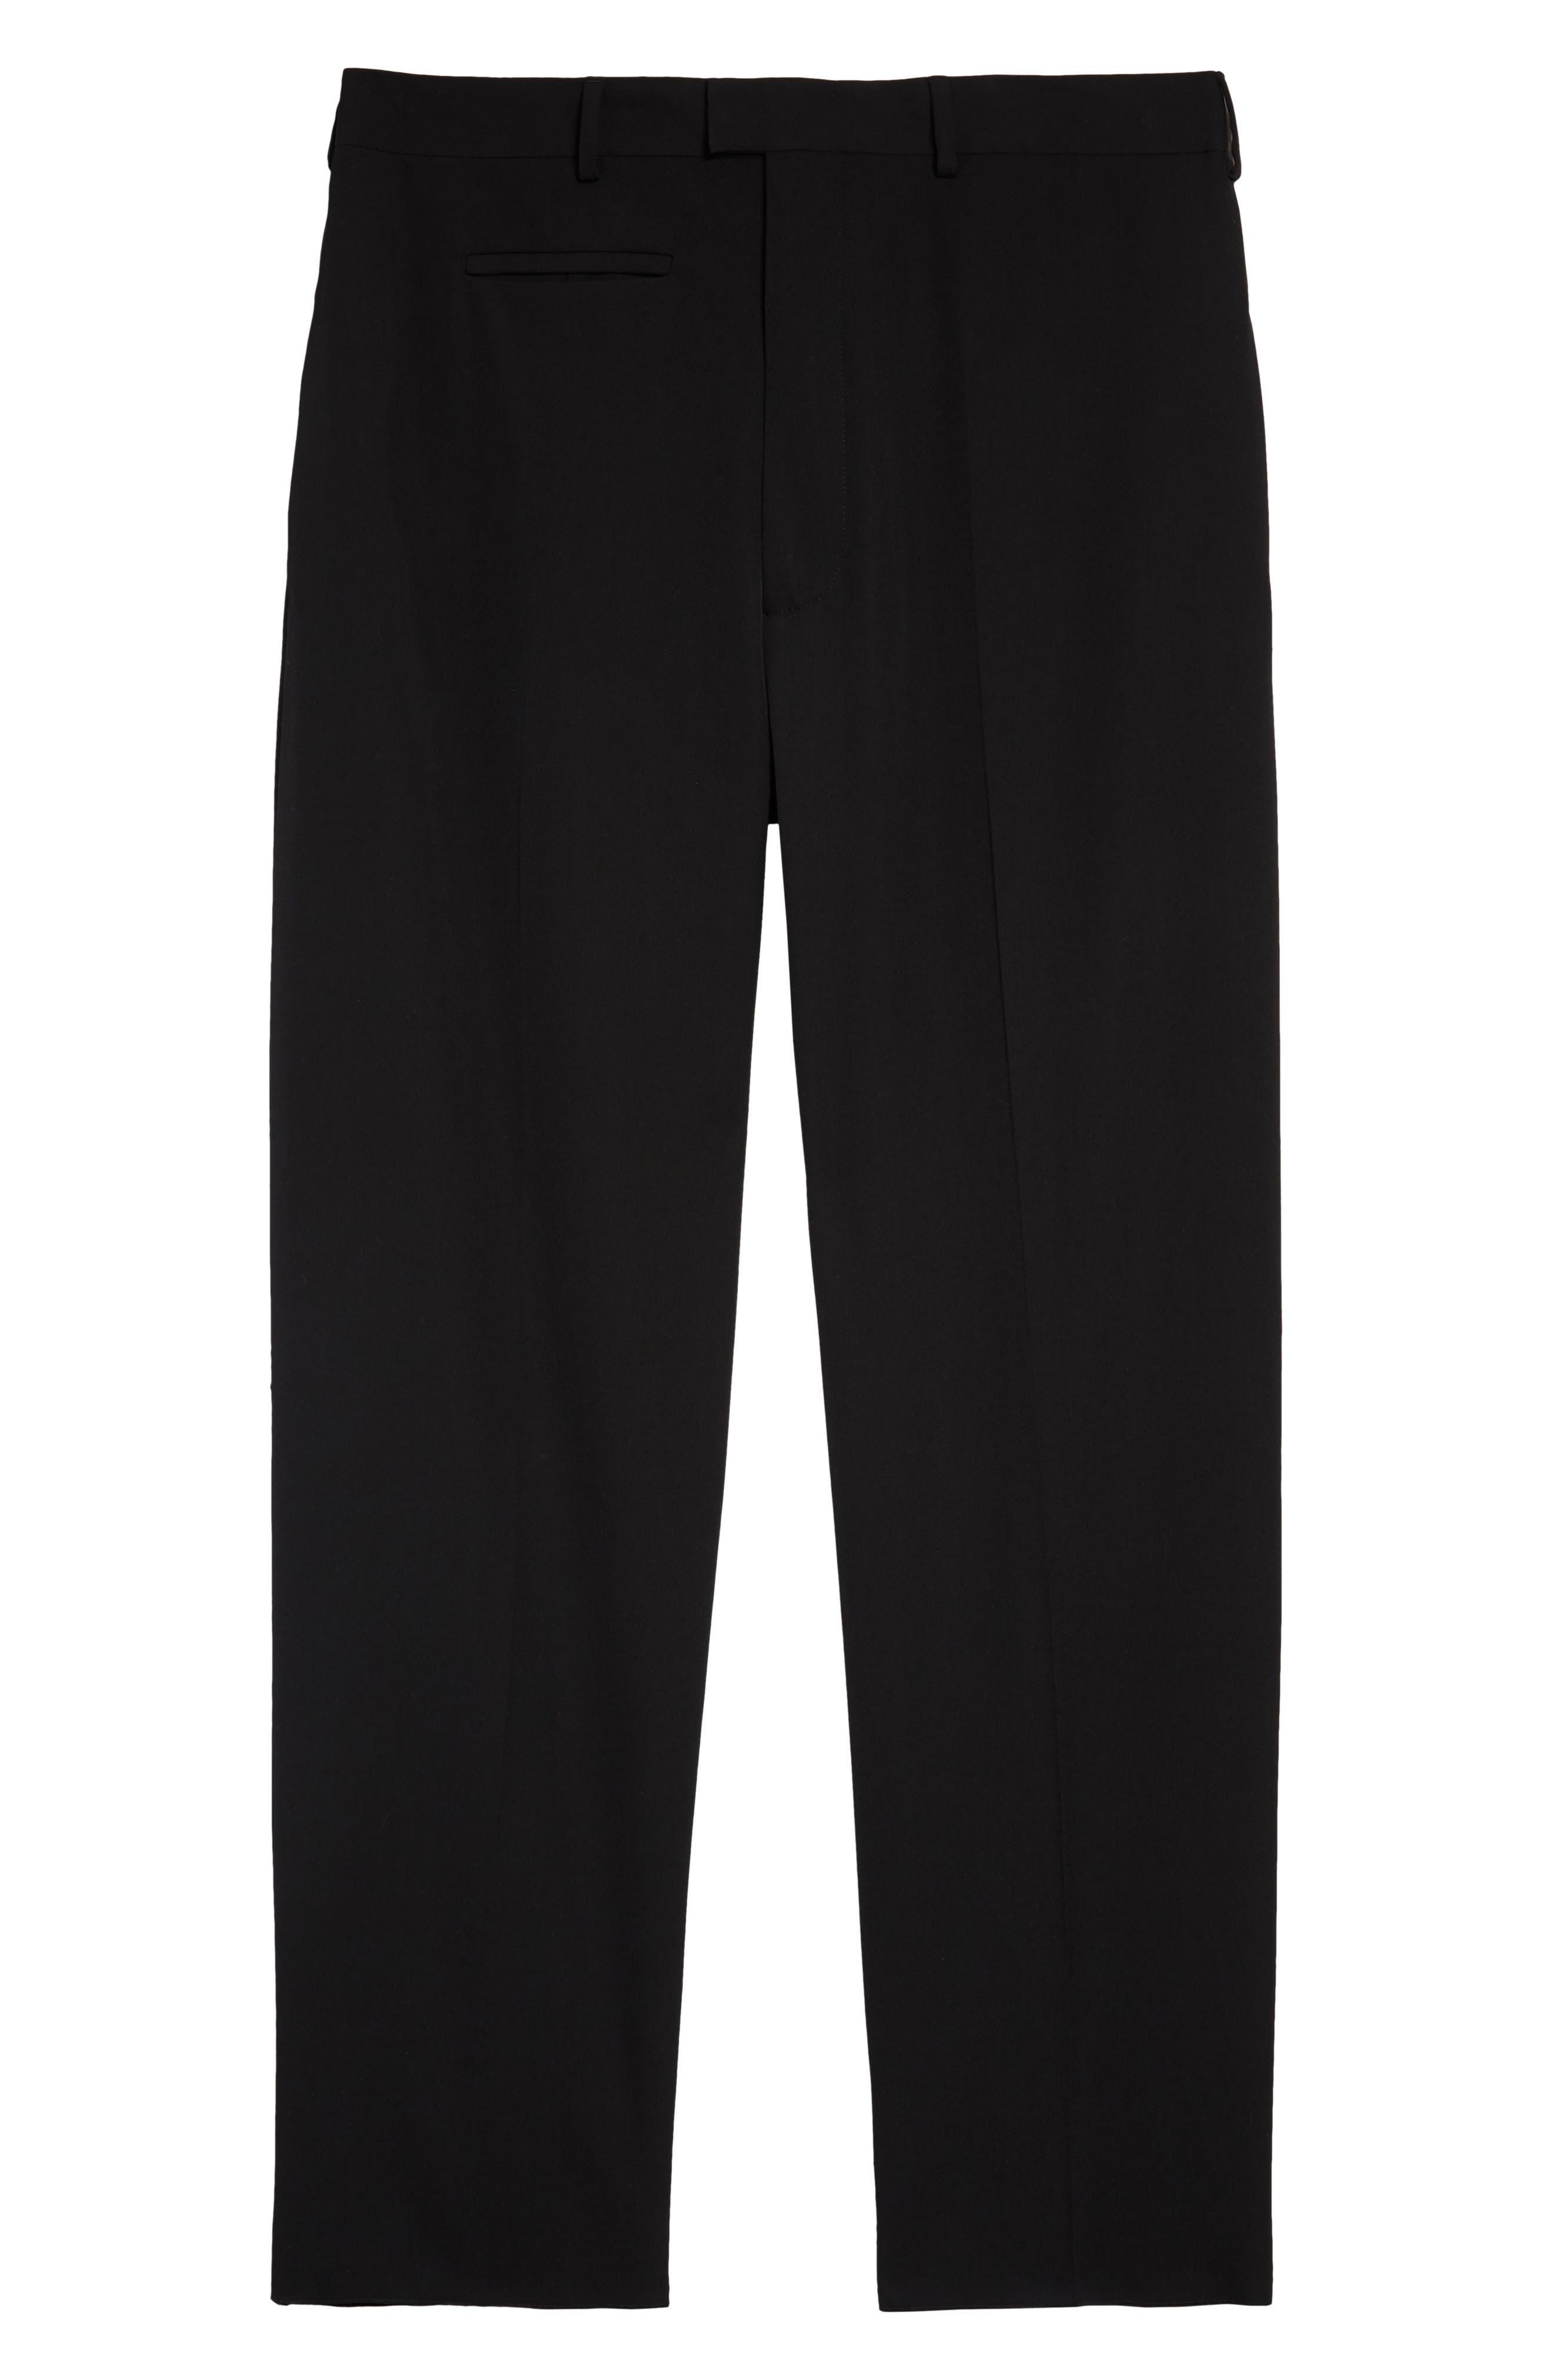 Men's Bottega Veneta Fluid Wool Gabardine Dress Pants,  52 EU - Black